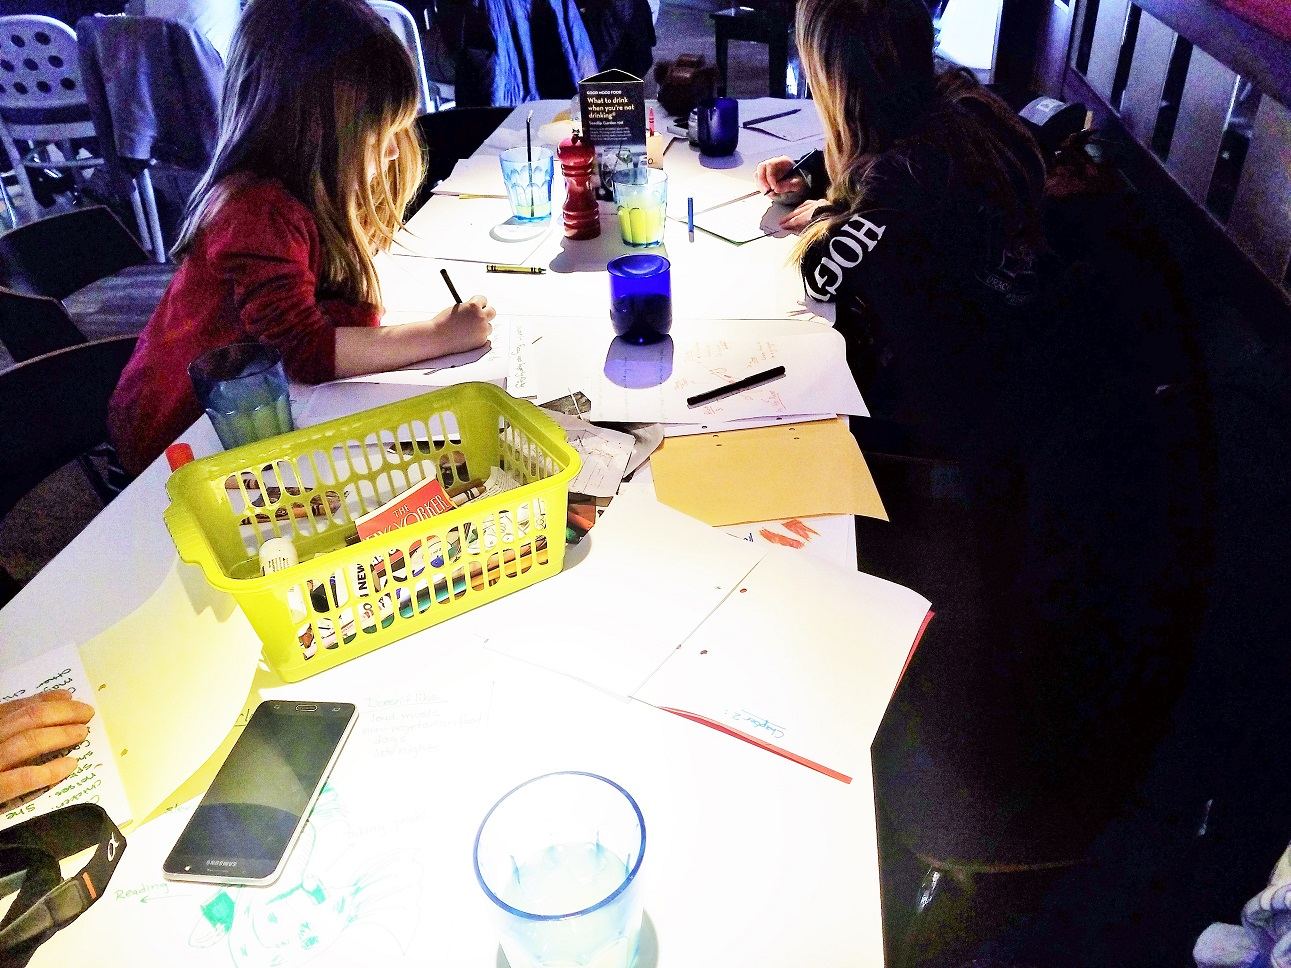 Storytelling workshop - easy story formula for kids